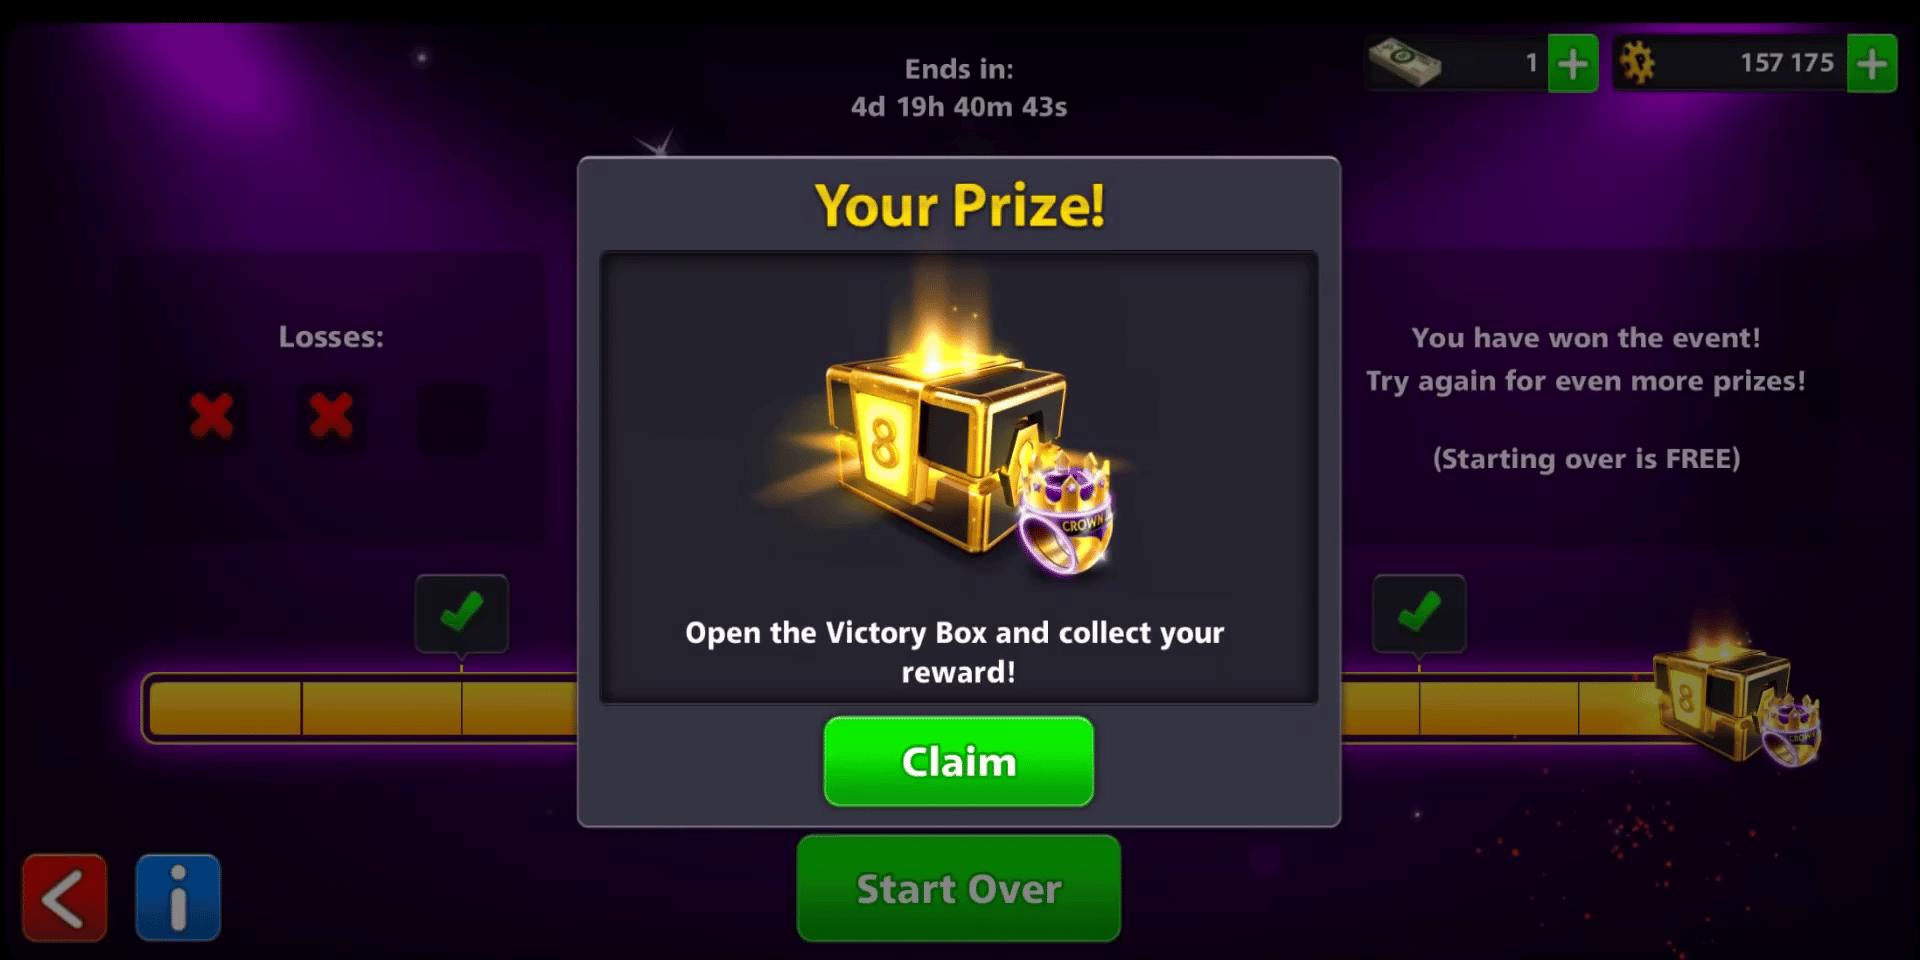 win streak free box